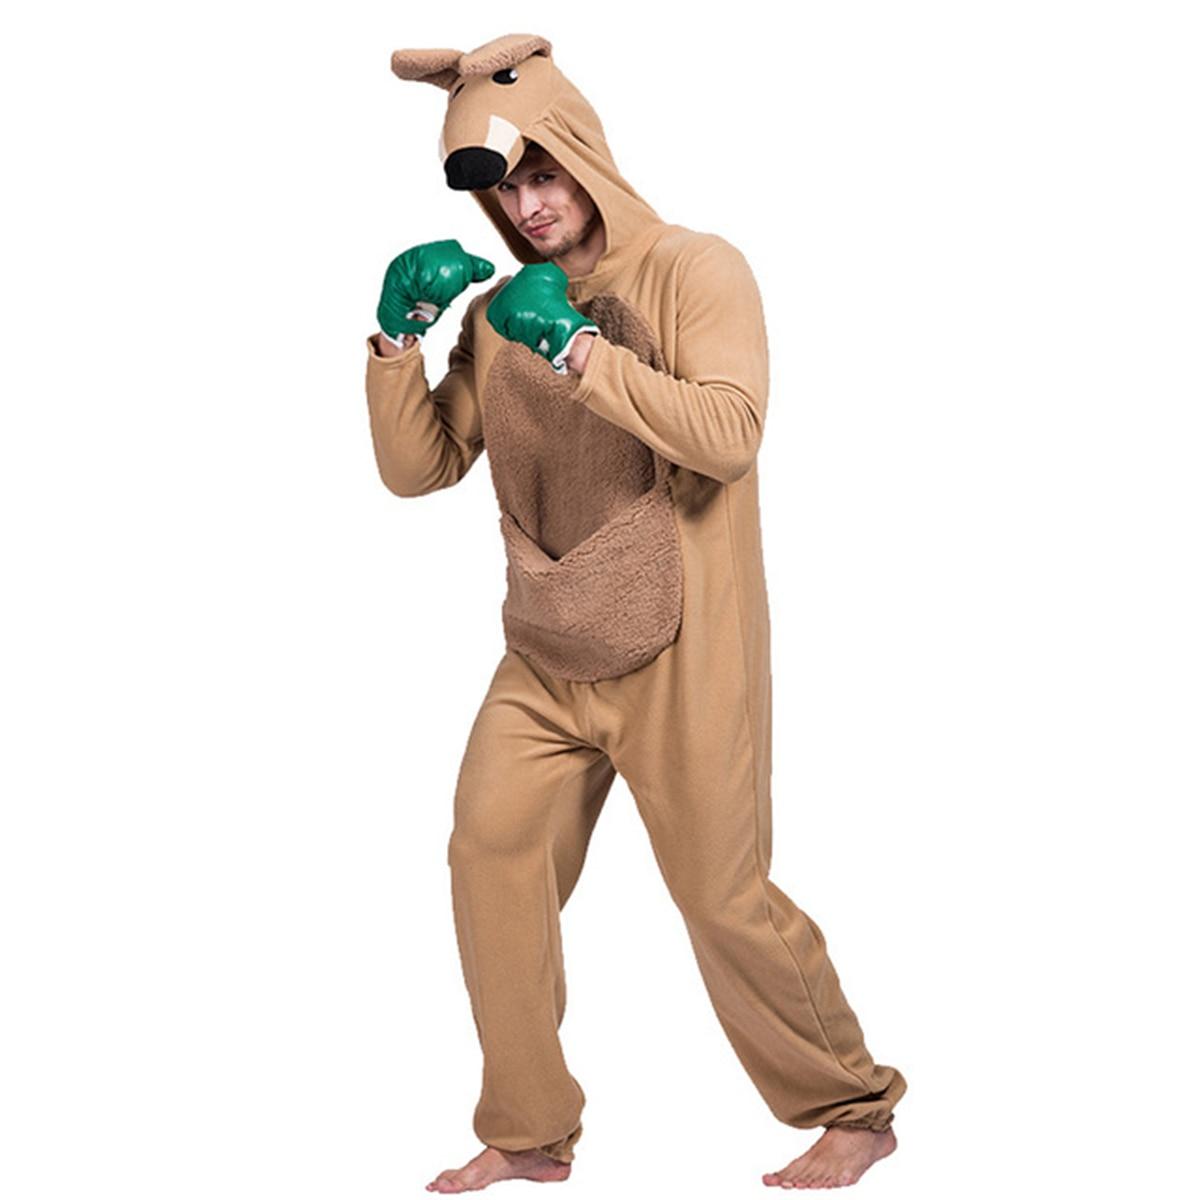 Halloween Adults Kangaroo Onesies Pajamas Halloween Sleepwear Jumpsuit Party Stage Performance Cosplay Costume for Mens Boys